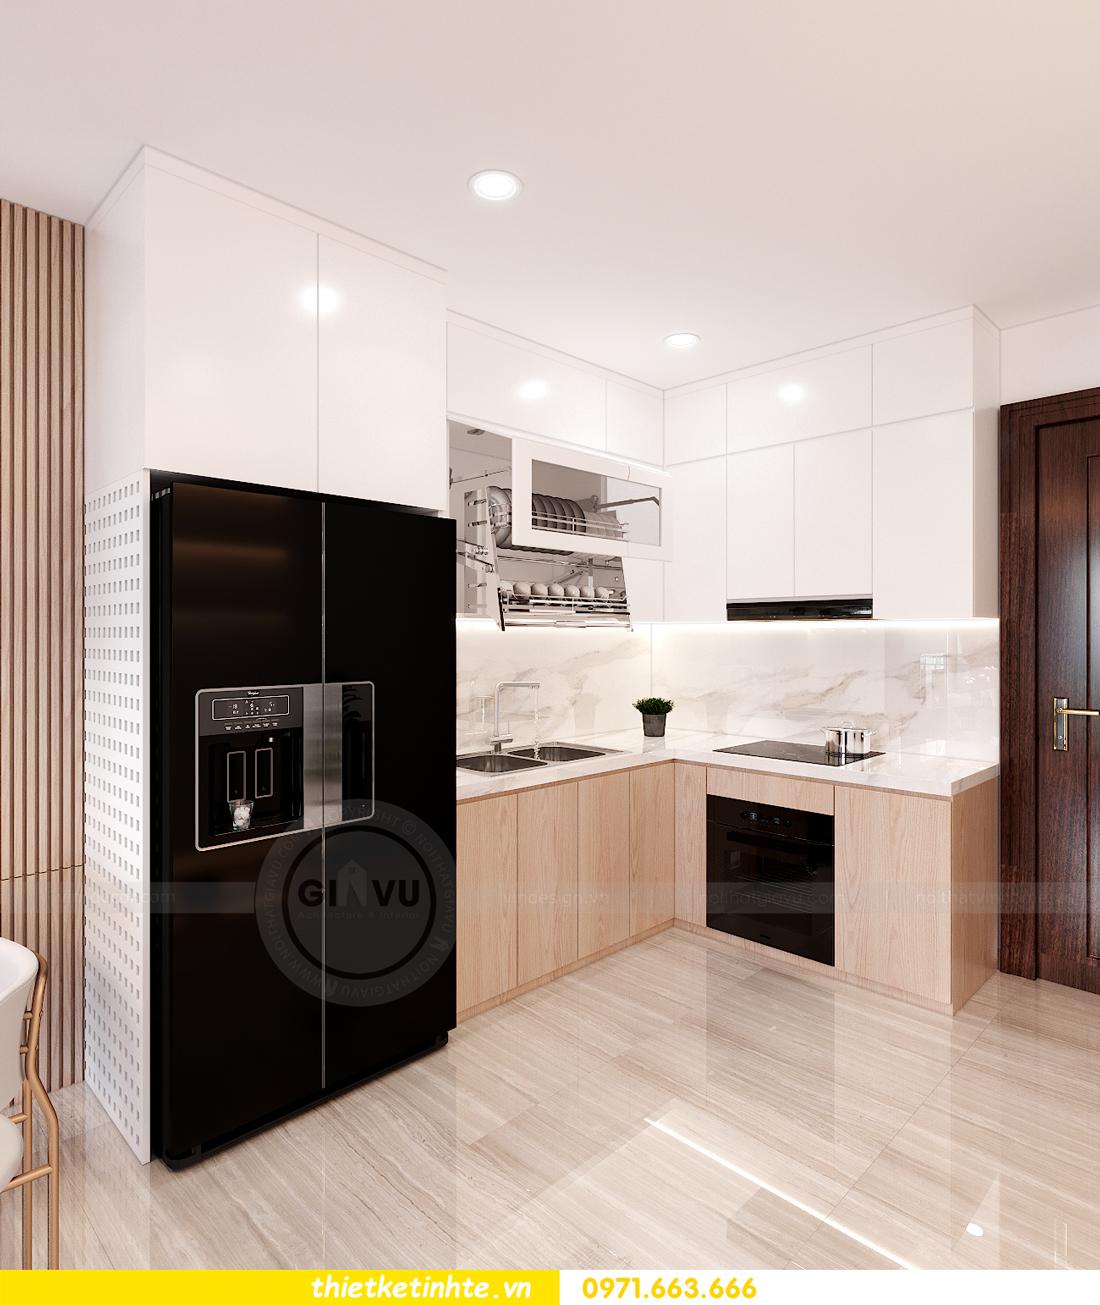 mẫu nội thất căn hộ Smart City tòa S202 căn 10A 2